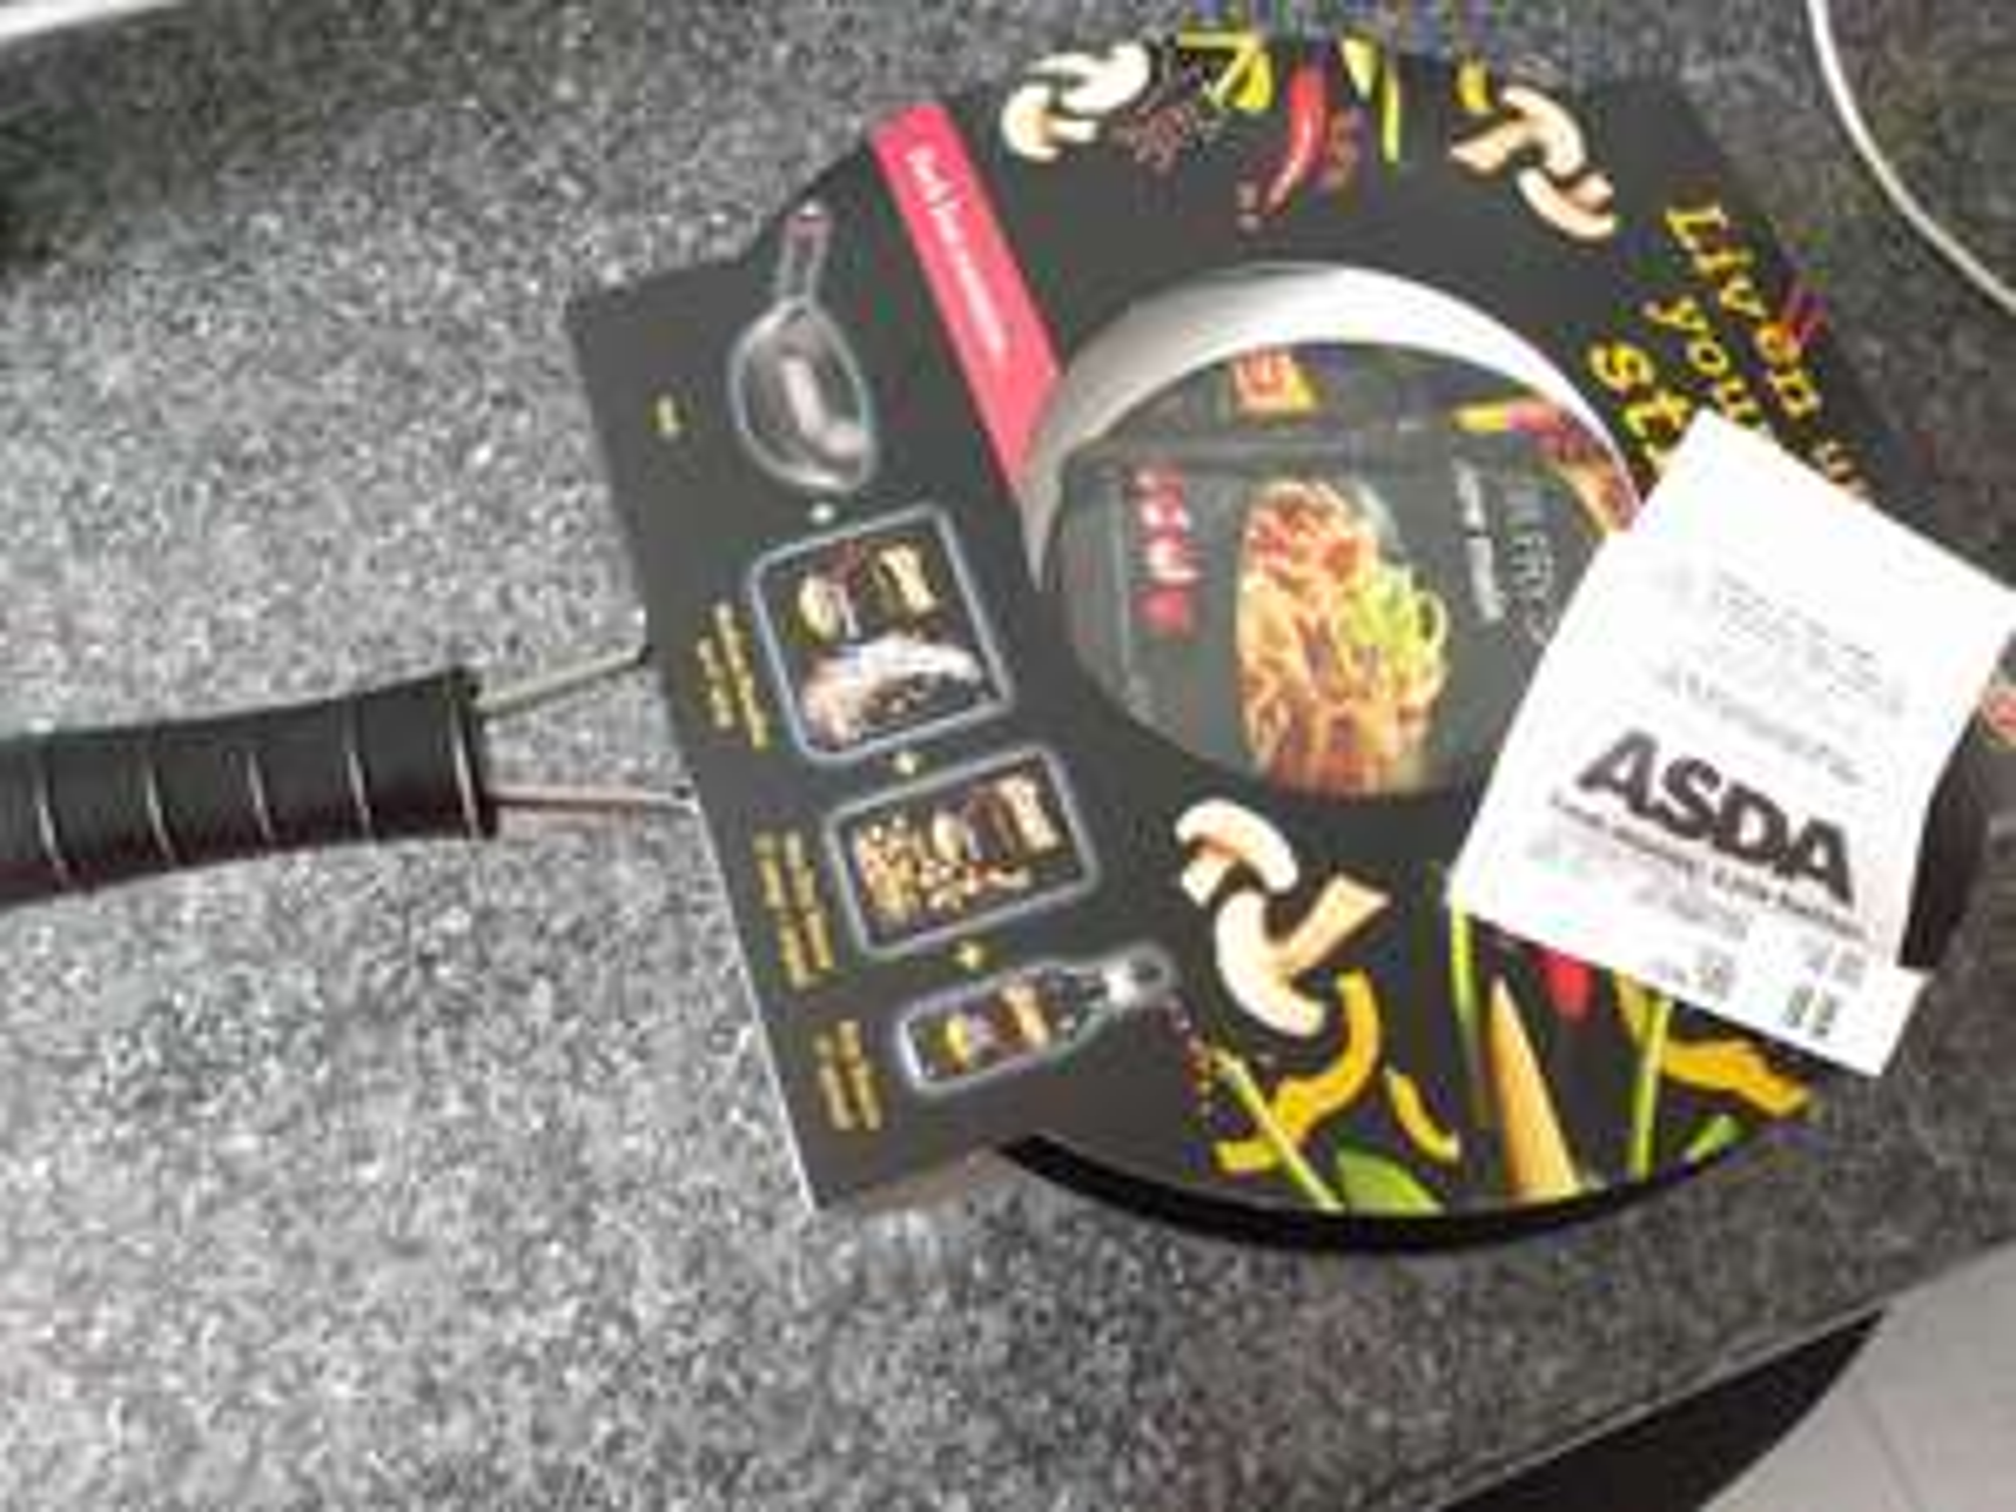 Wok, noodles and sauces - £5 instore @ Asda - Fosse Park